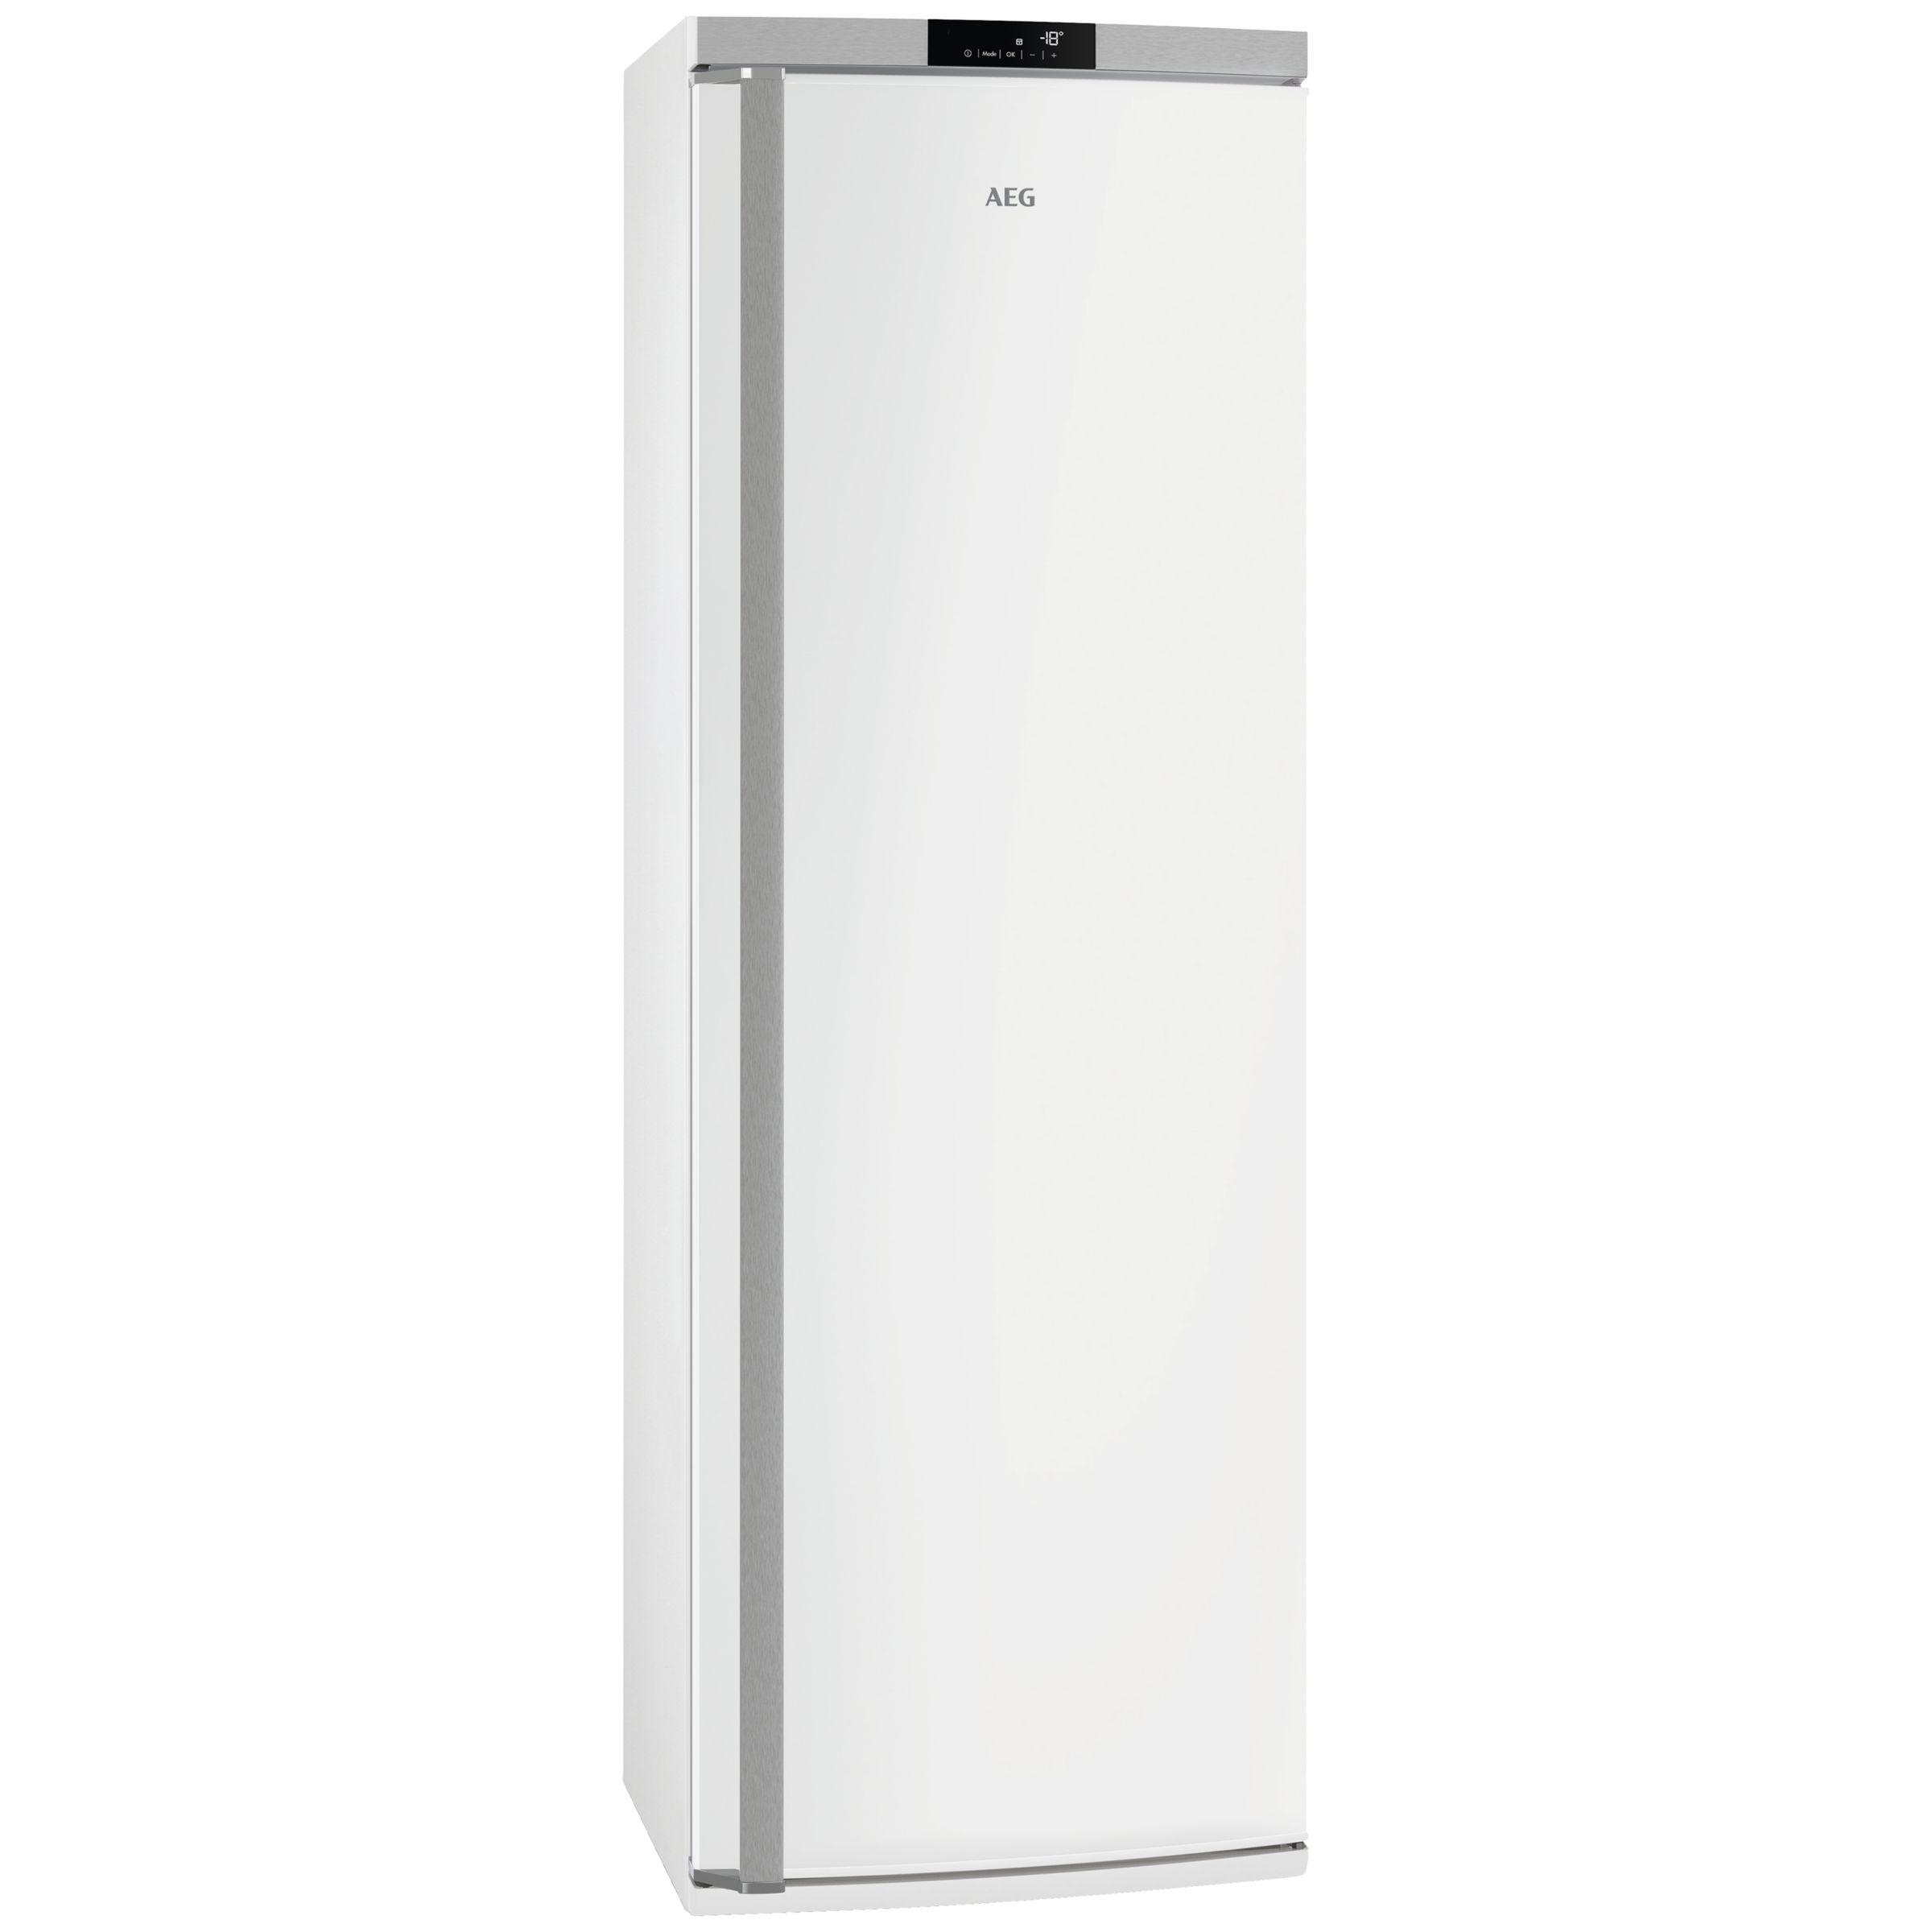 AEG AEG AGE62526NW Tall Freezer, A++ Energy Rating, 59.5cm Wide, White